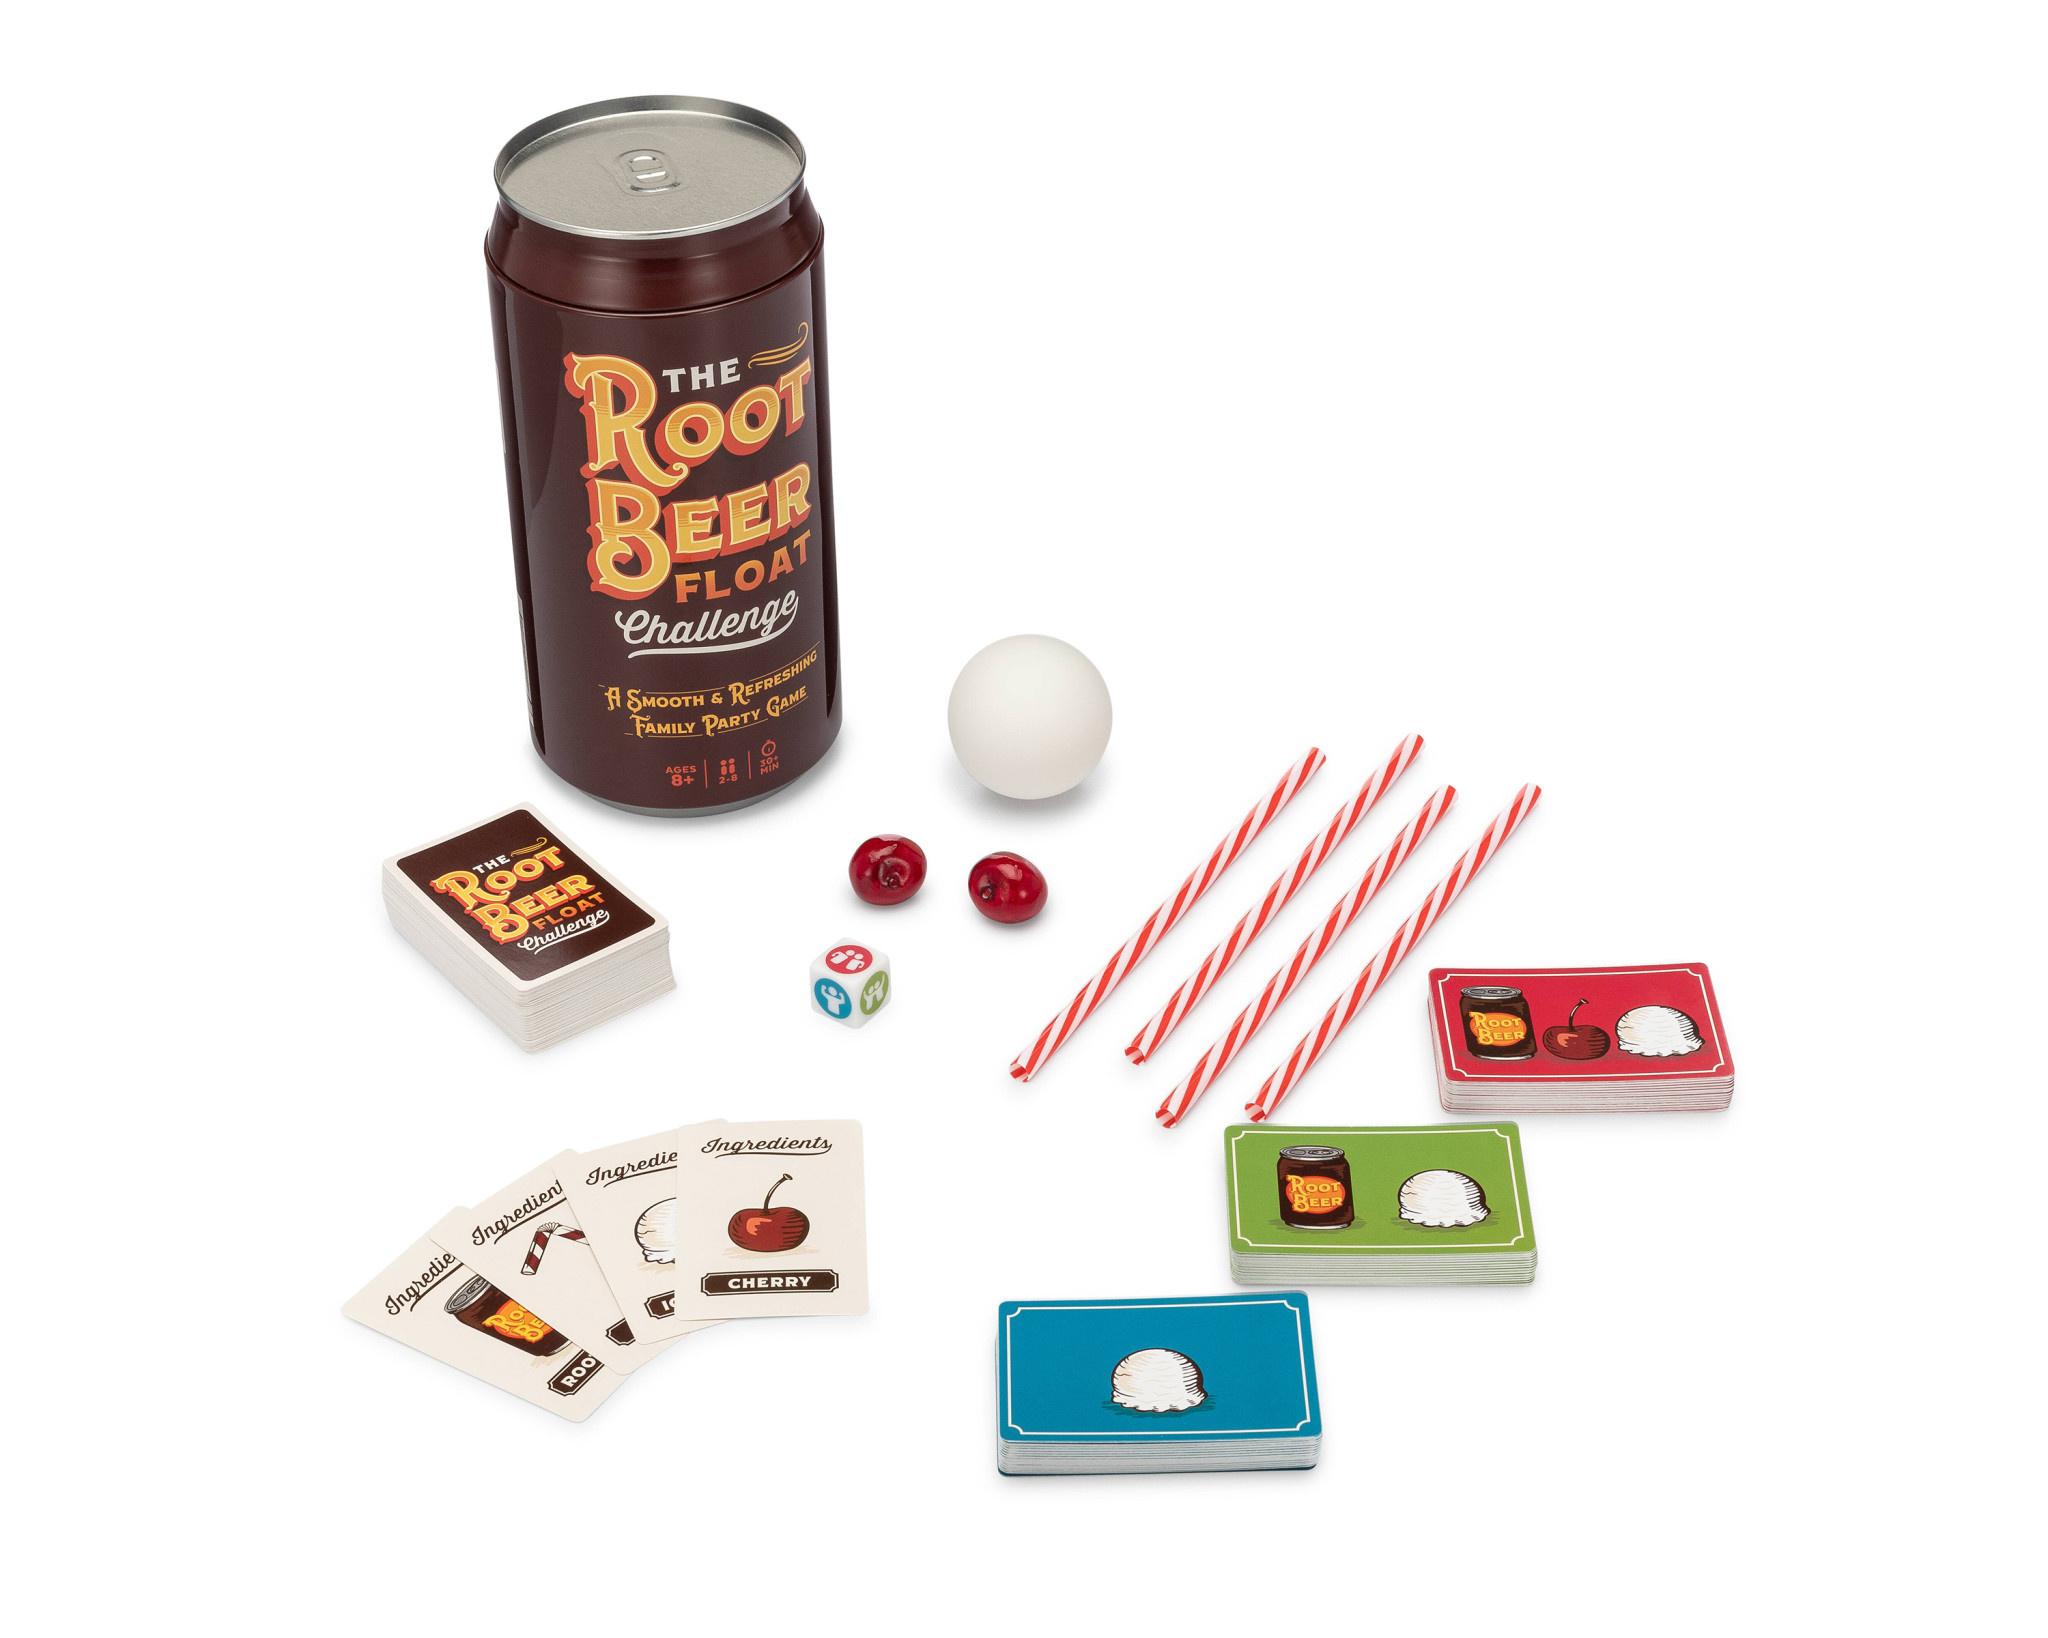 The Root Beer Float Challenge Game-2